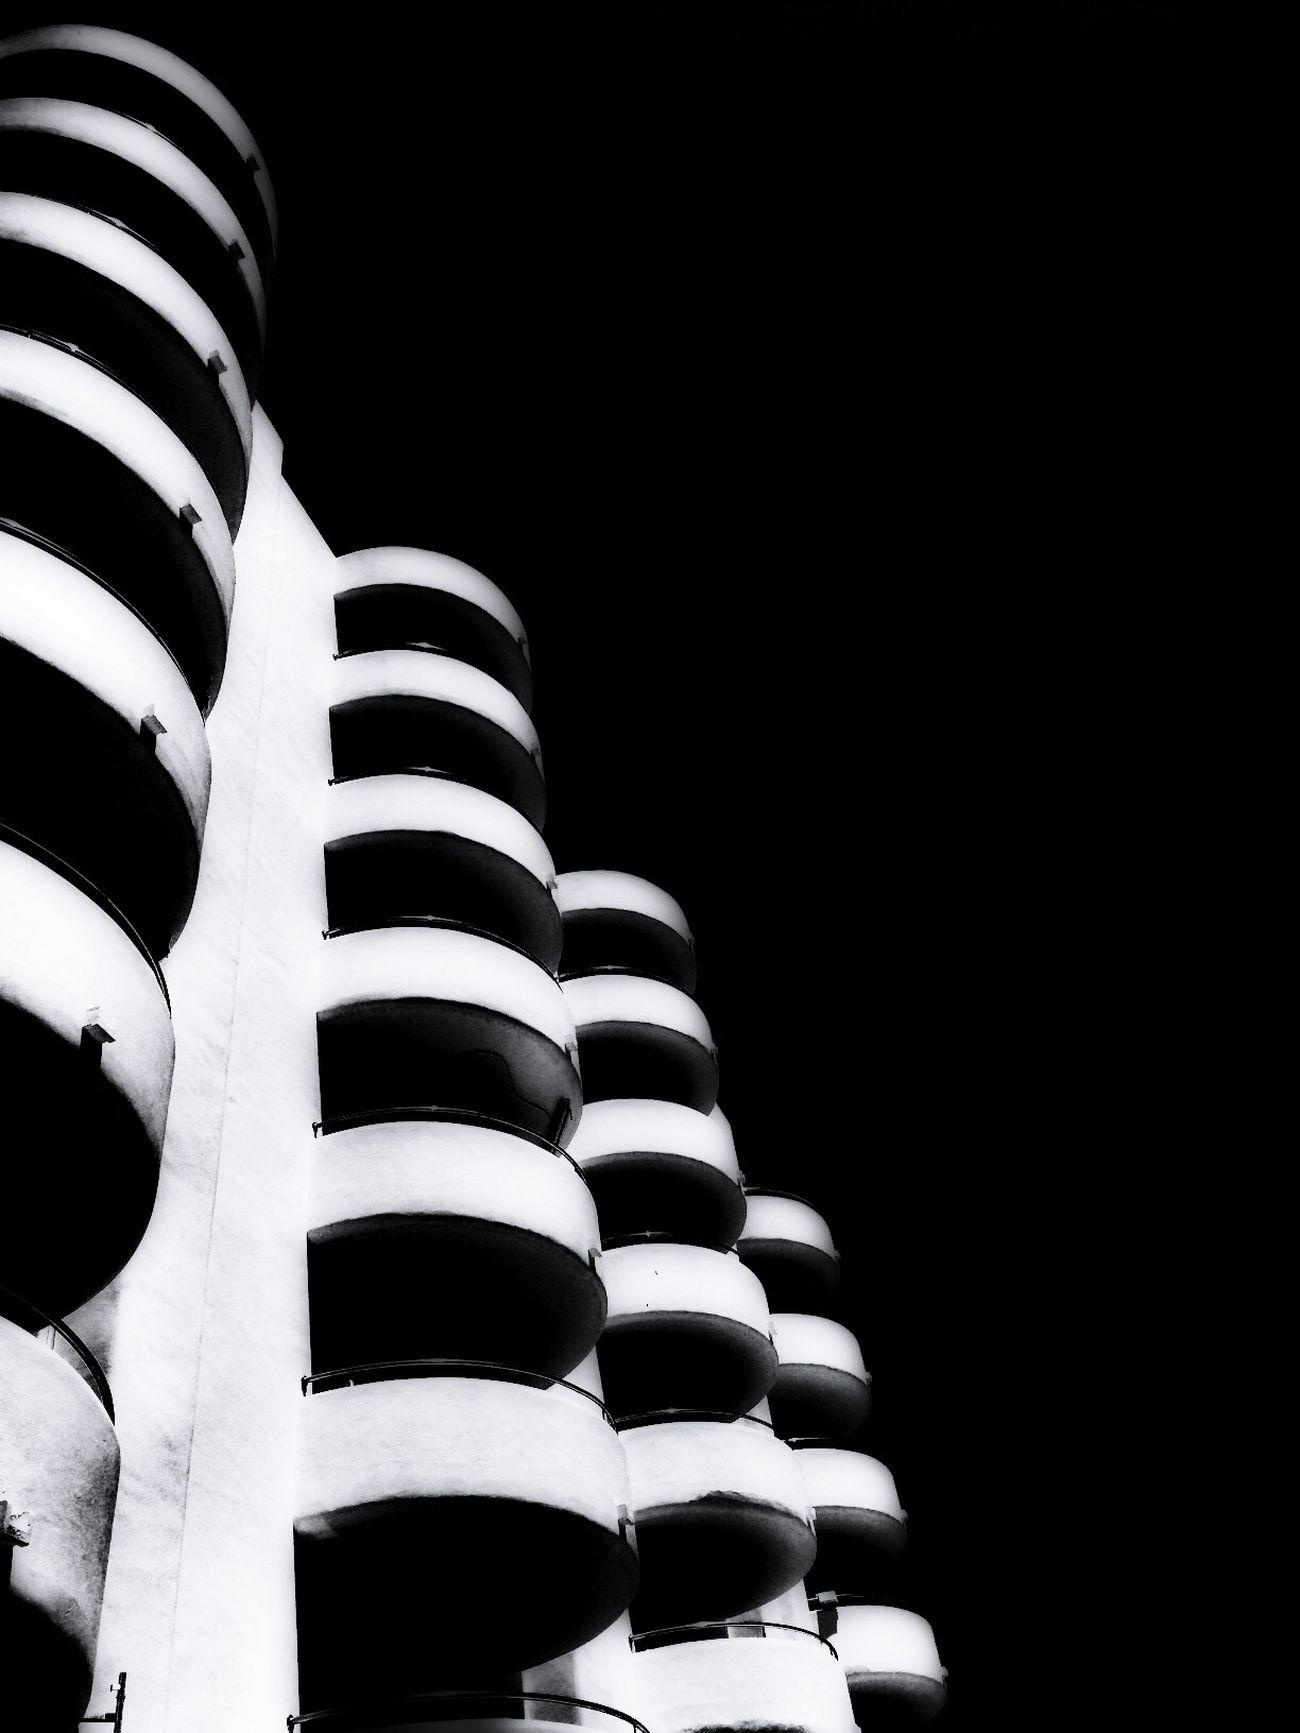 Blackandwhite Darkness And Light Urbanexploration Brutal_architecture Light In The Darkness Negro Black Blanco White España